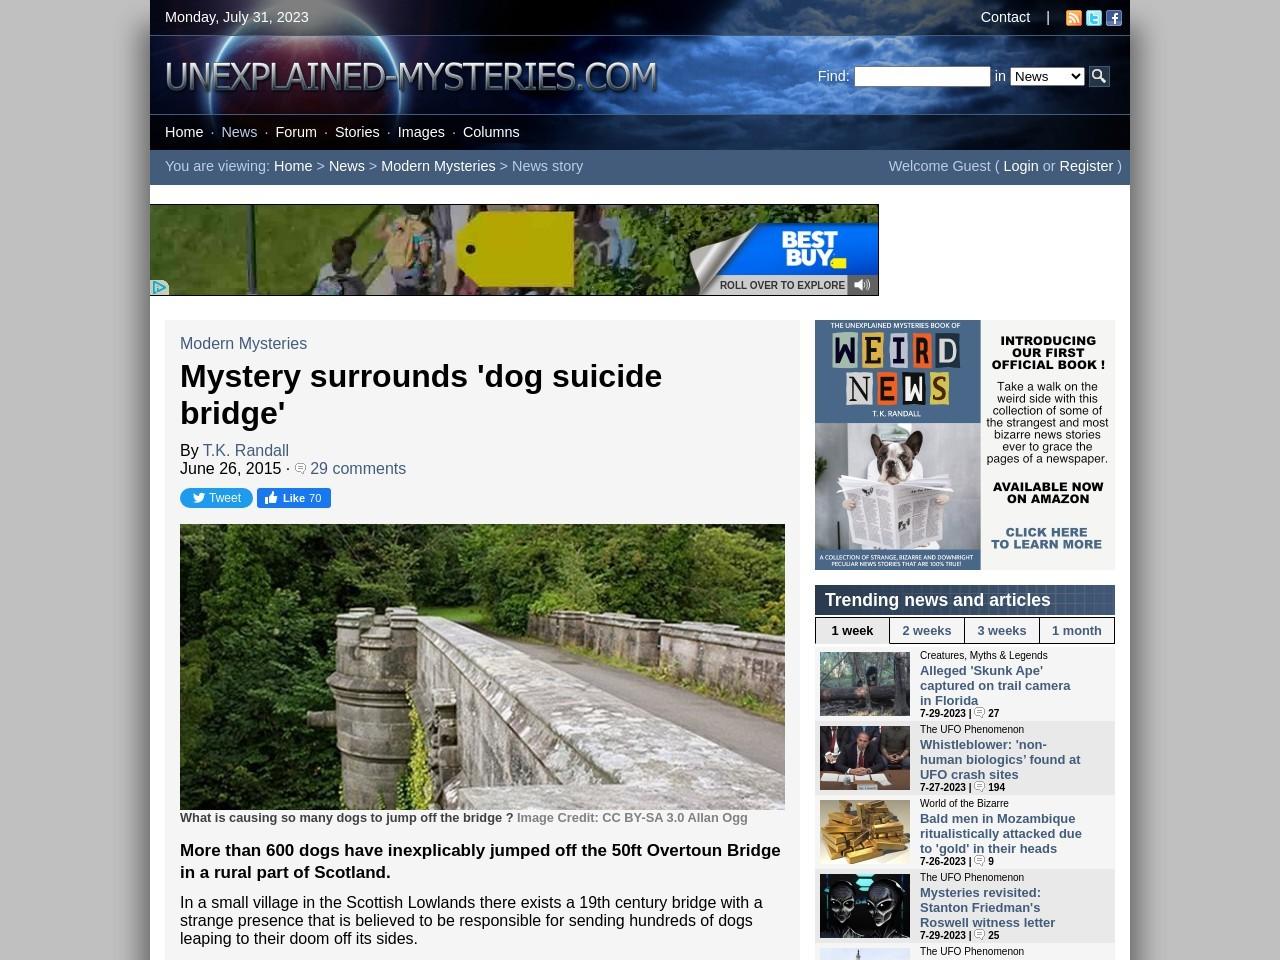 Mystery surrounds 'dog suicide bridge'